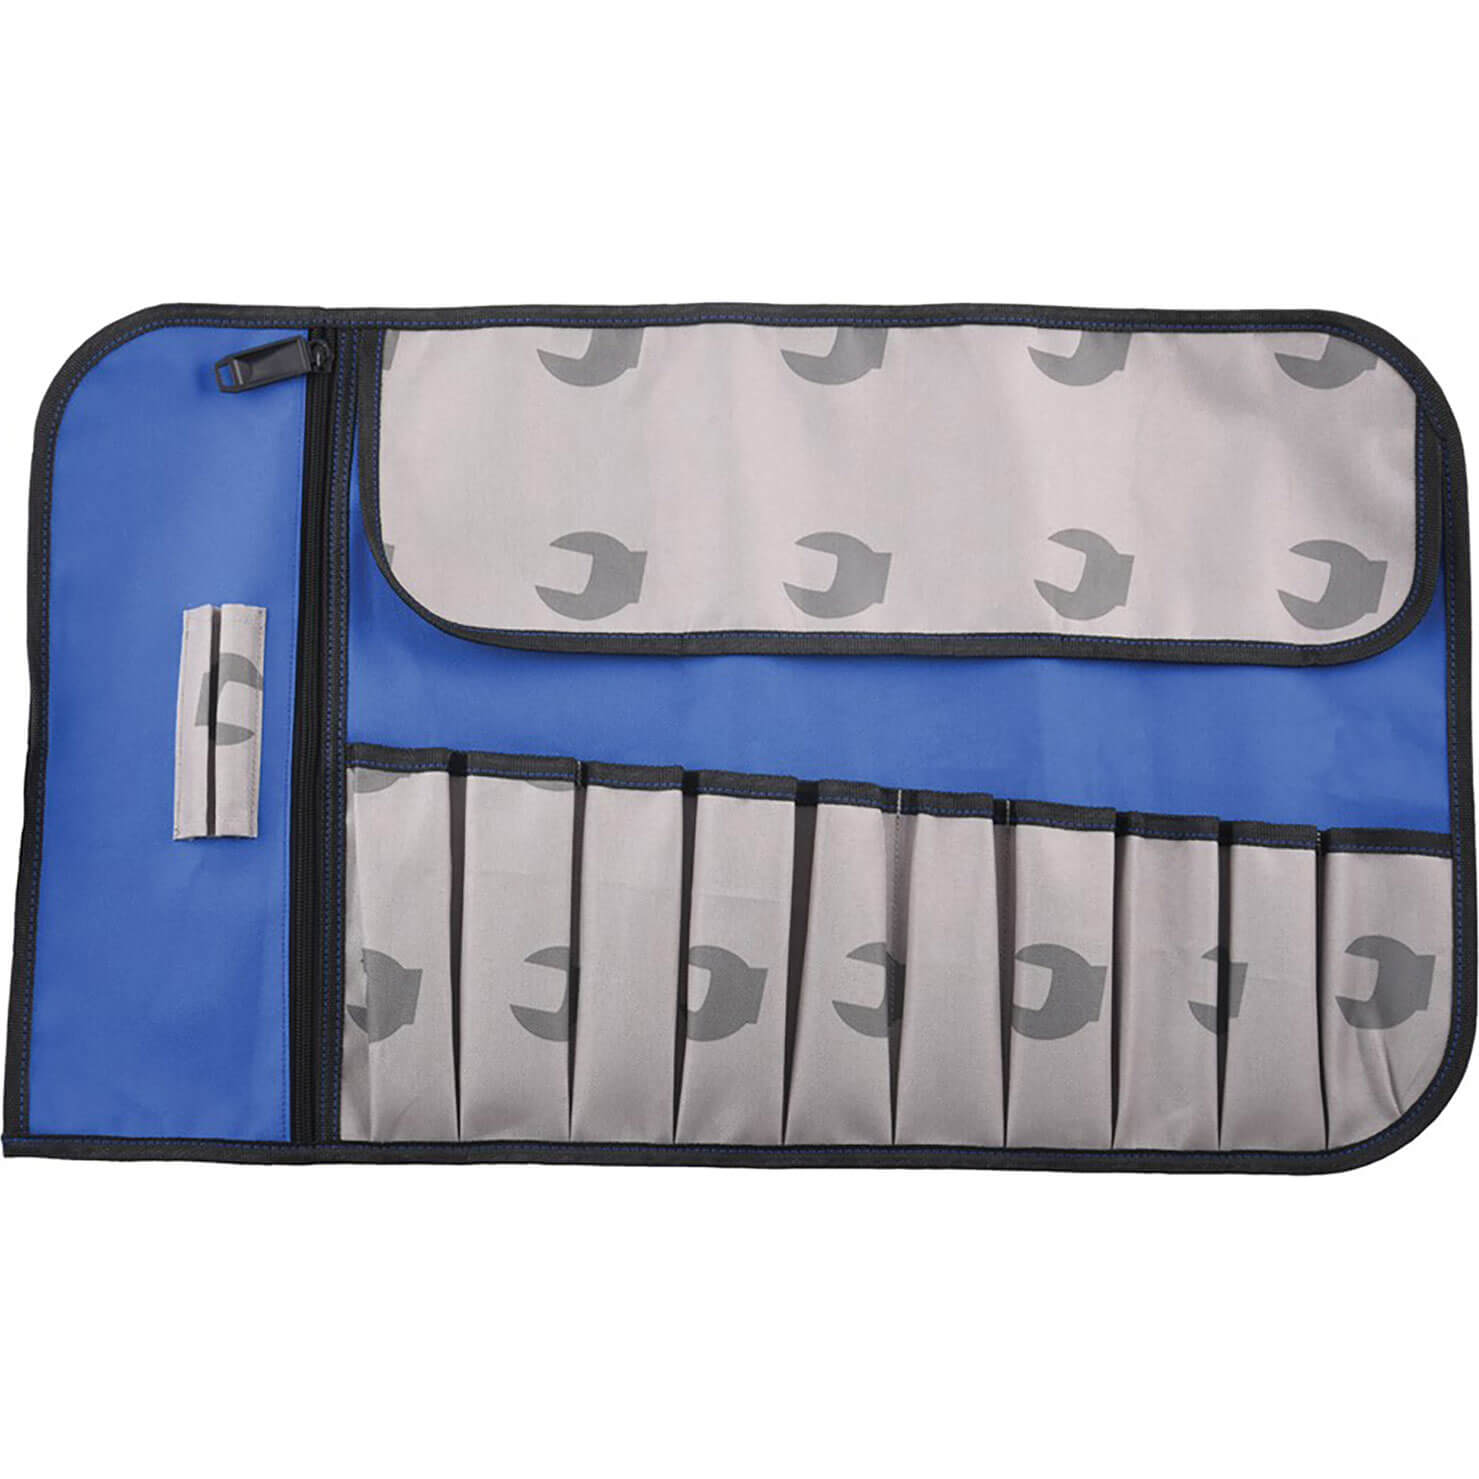 Image of Kincrome 10 Pocket Tool Roll